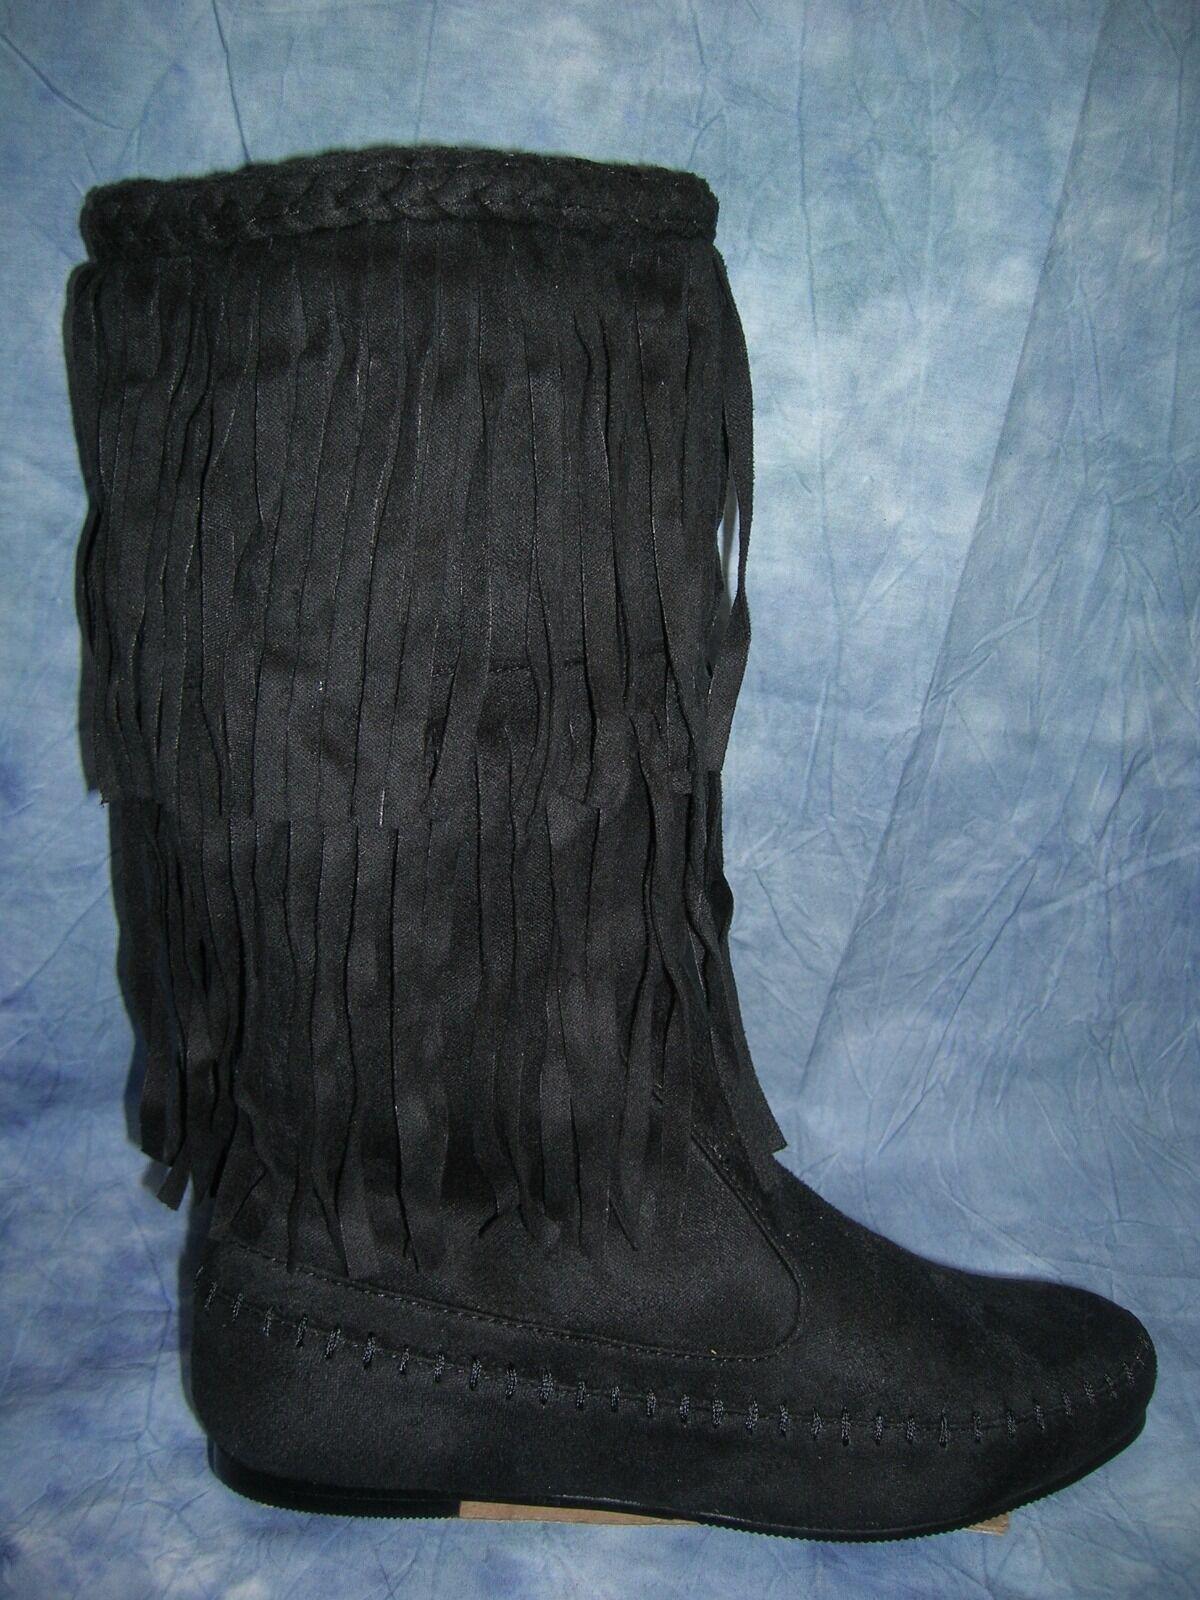 WILD DIVA BLACK SUPER SUEDE WESTERN BOOTS w/ FRINGES  SIZE 7